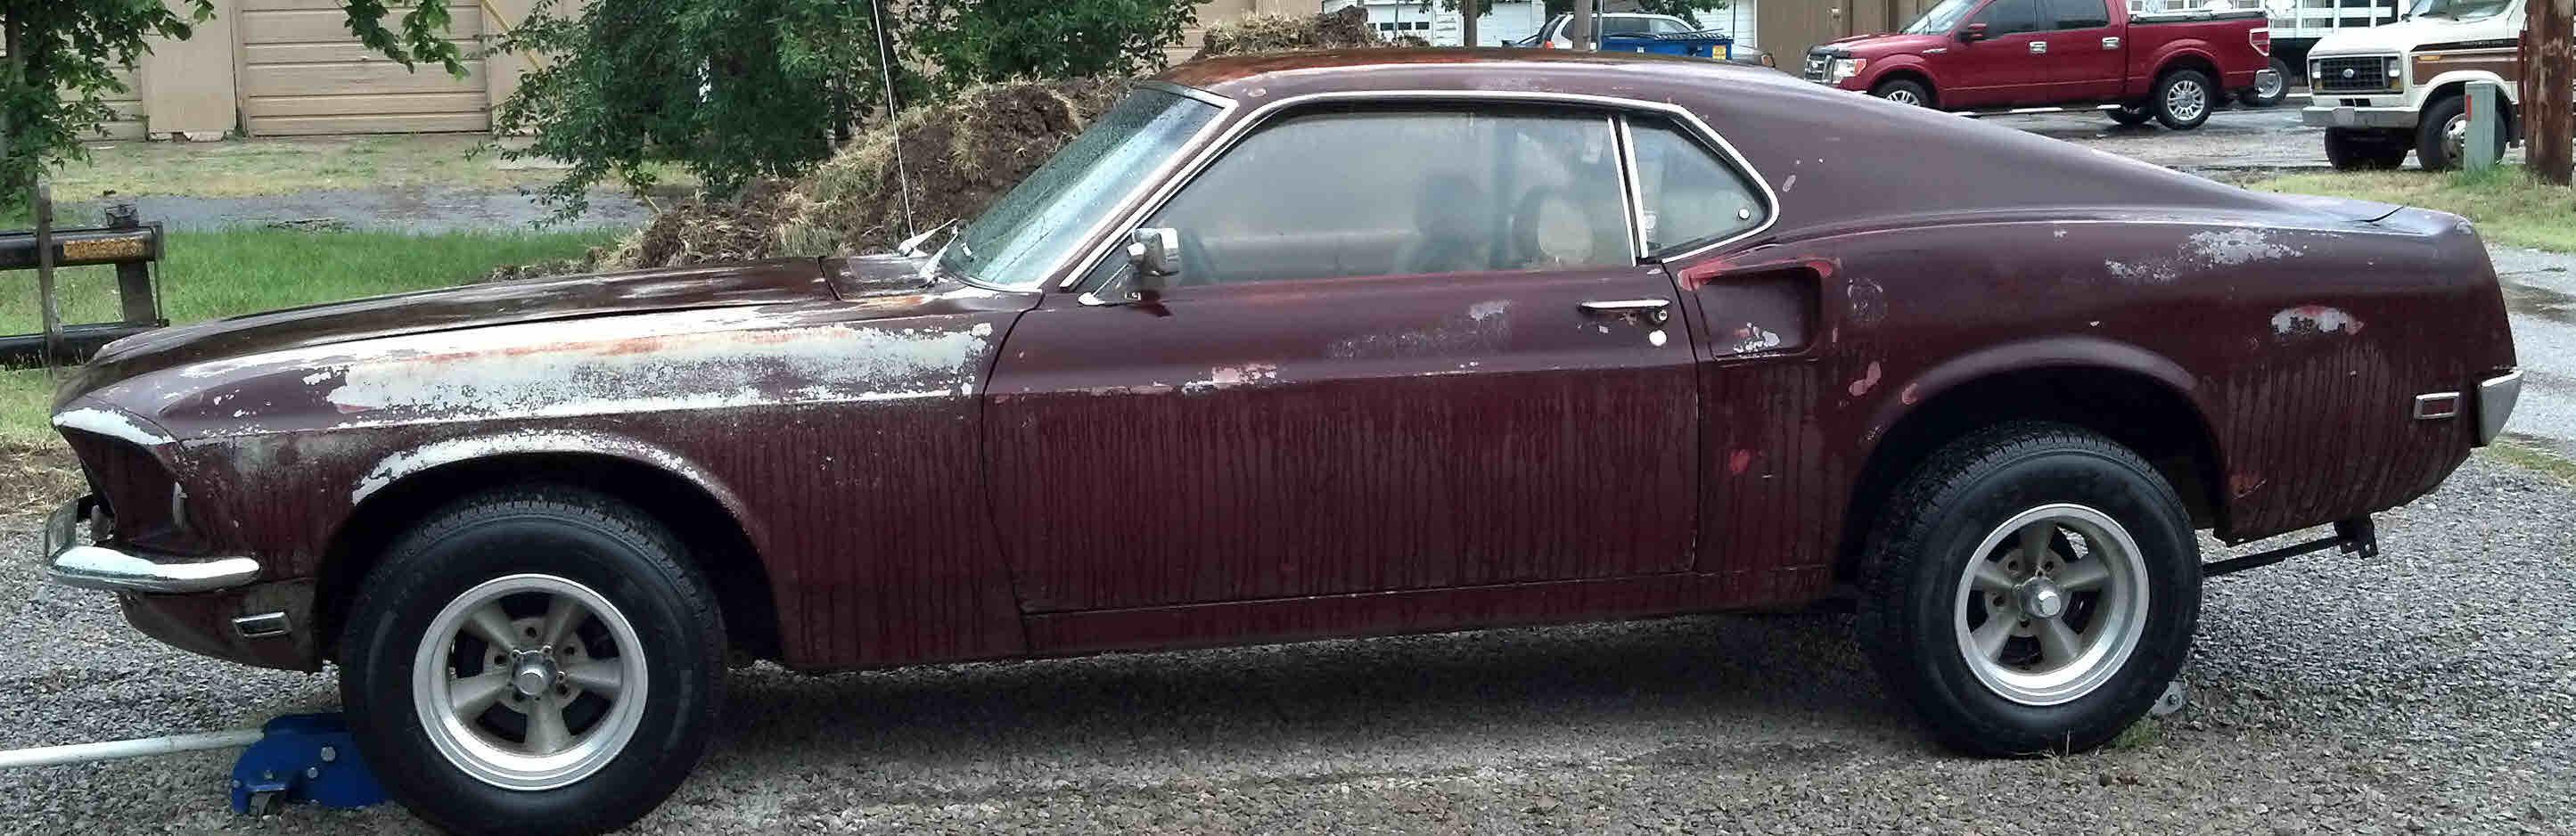 Loughmiller Motors 1930 Model A Wiring Harness 1969 Ford Mustang Fastback Sold Originally Bright Red White Vinyl Seats Black Carpet 302 V 8 Auto C 4 2 Door Am Radio